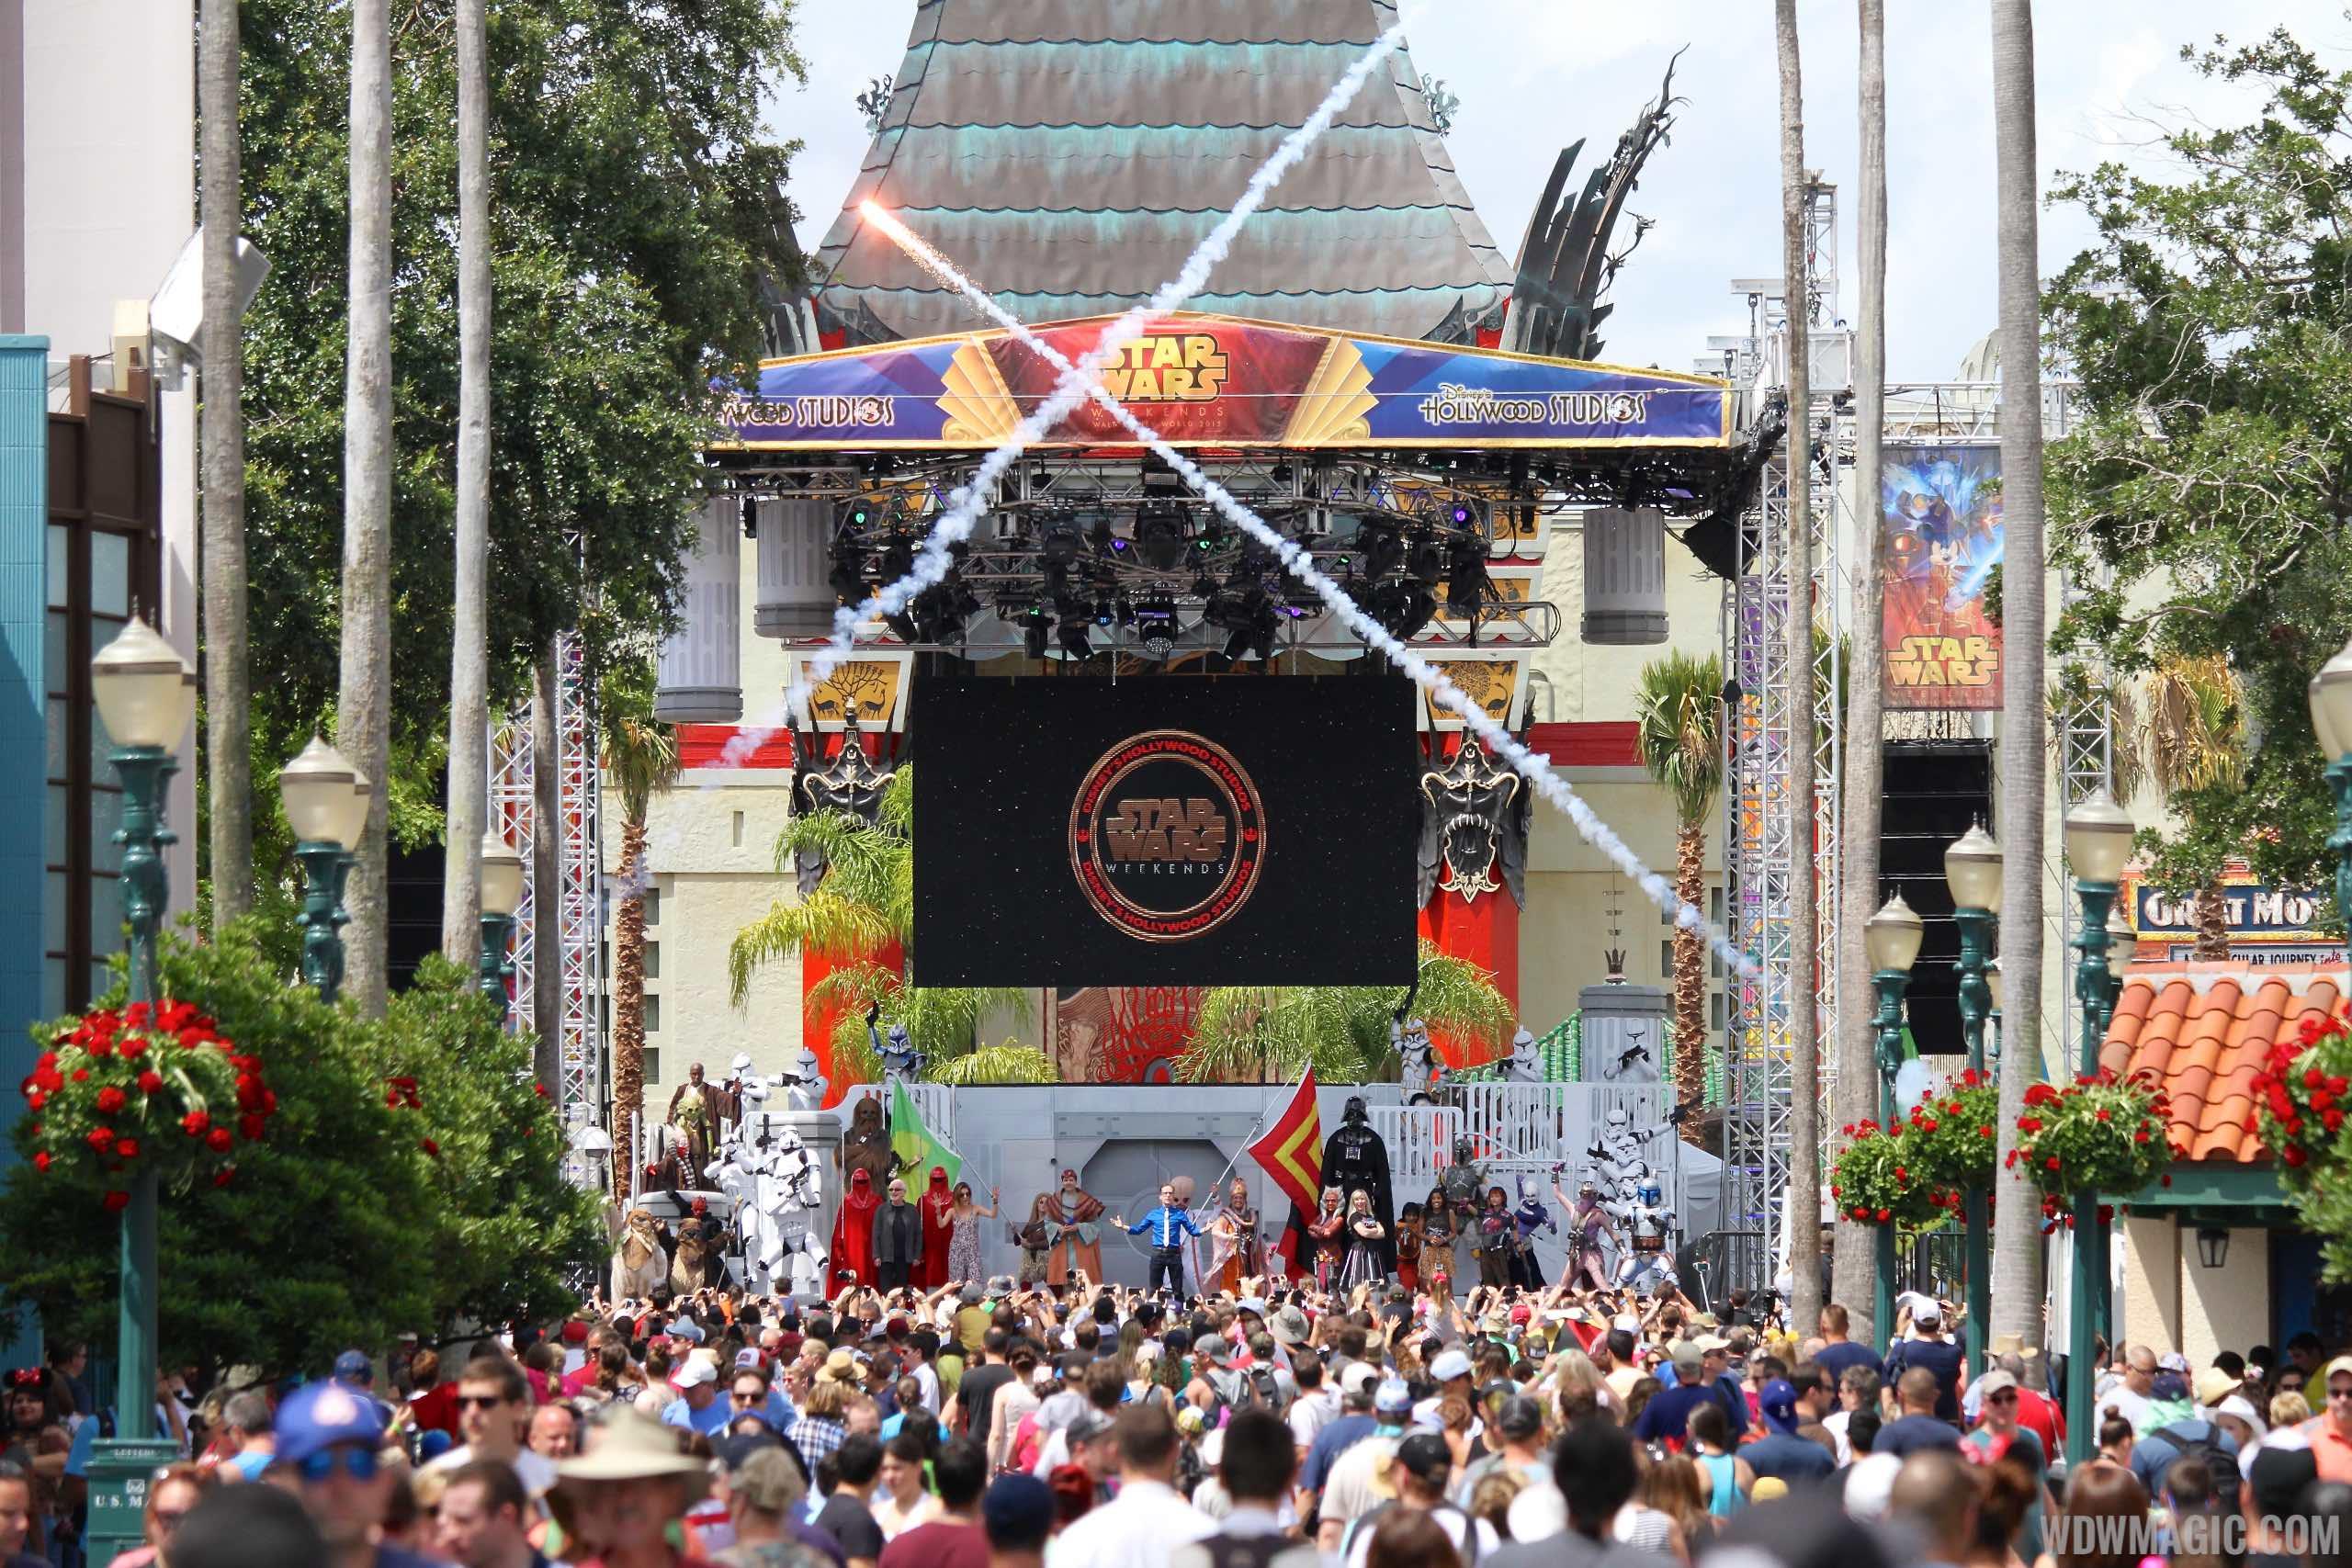 2015 Star Wars Weekends - Weekend 1 Legends of the Force motorcade celebrities - On Stage Welcome